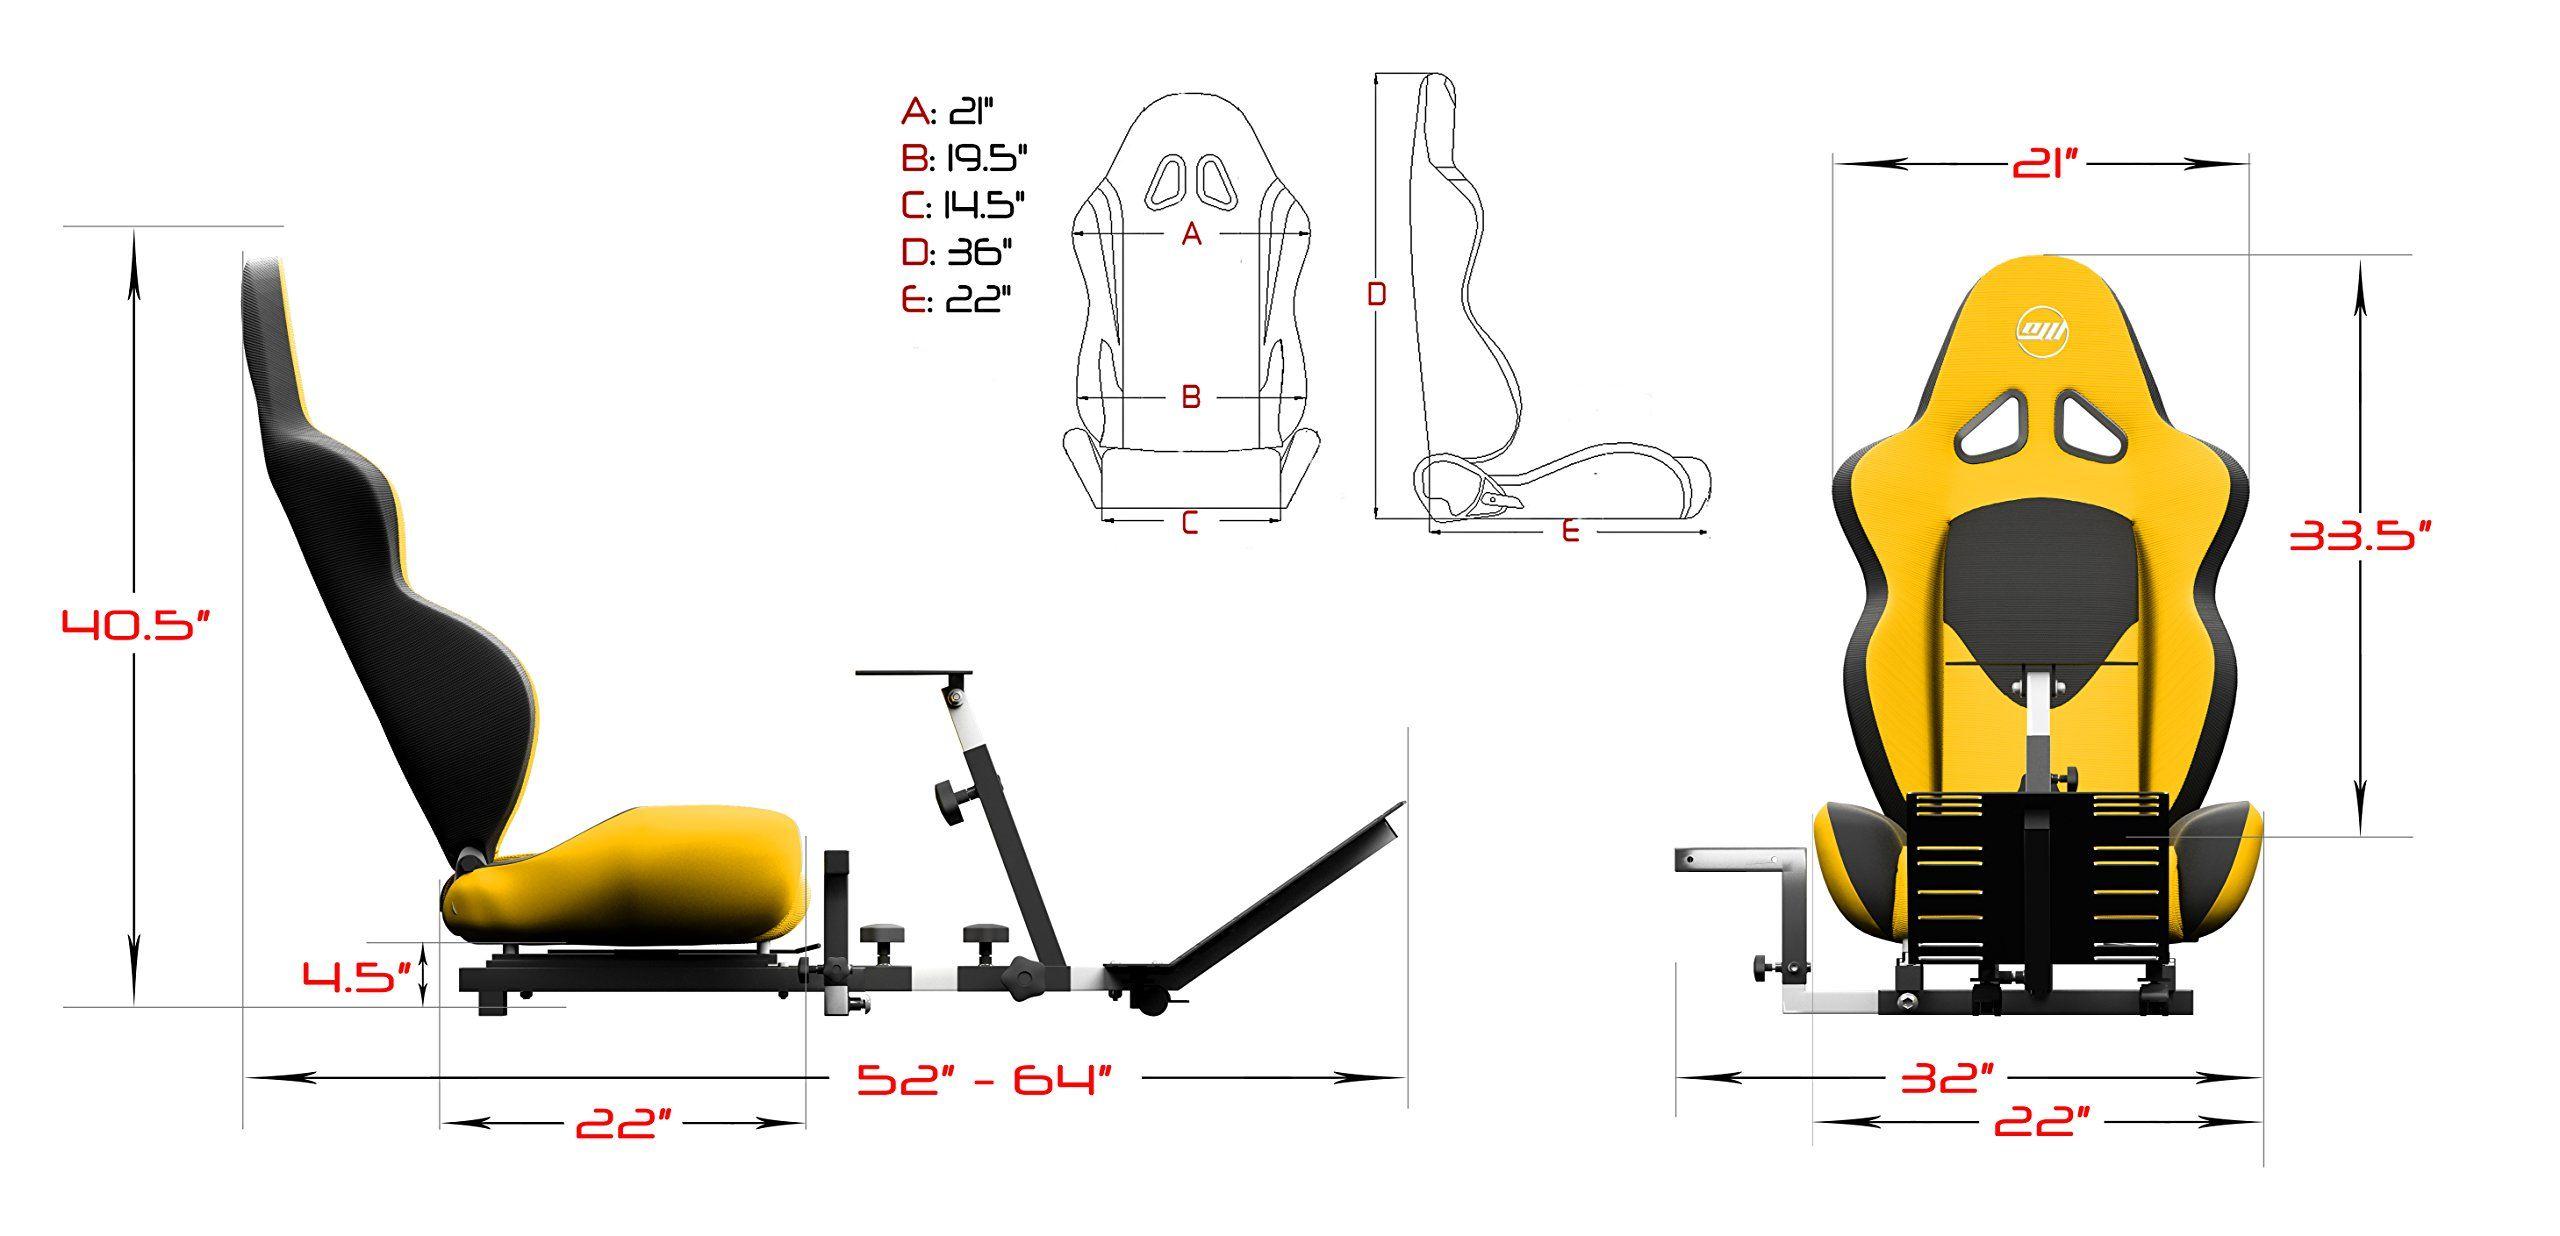 be83612ae82 Openwheeler GEN2 Racing Wheel Stand Cockpit Yellow on Black Fits All  Logitech G29 G920 All Thrustmaster All Fanatec Wheels,#Stand, #Cockpit,  #Yellow, #Wheel